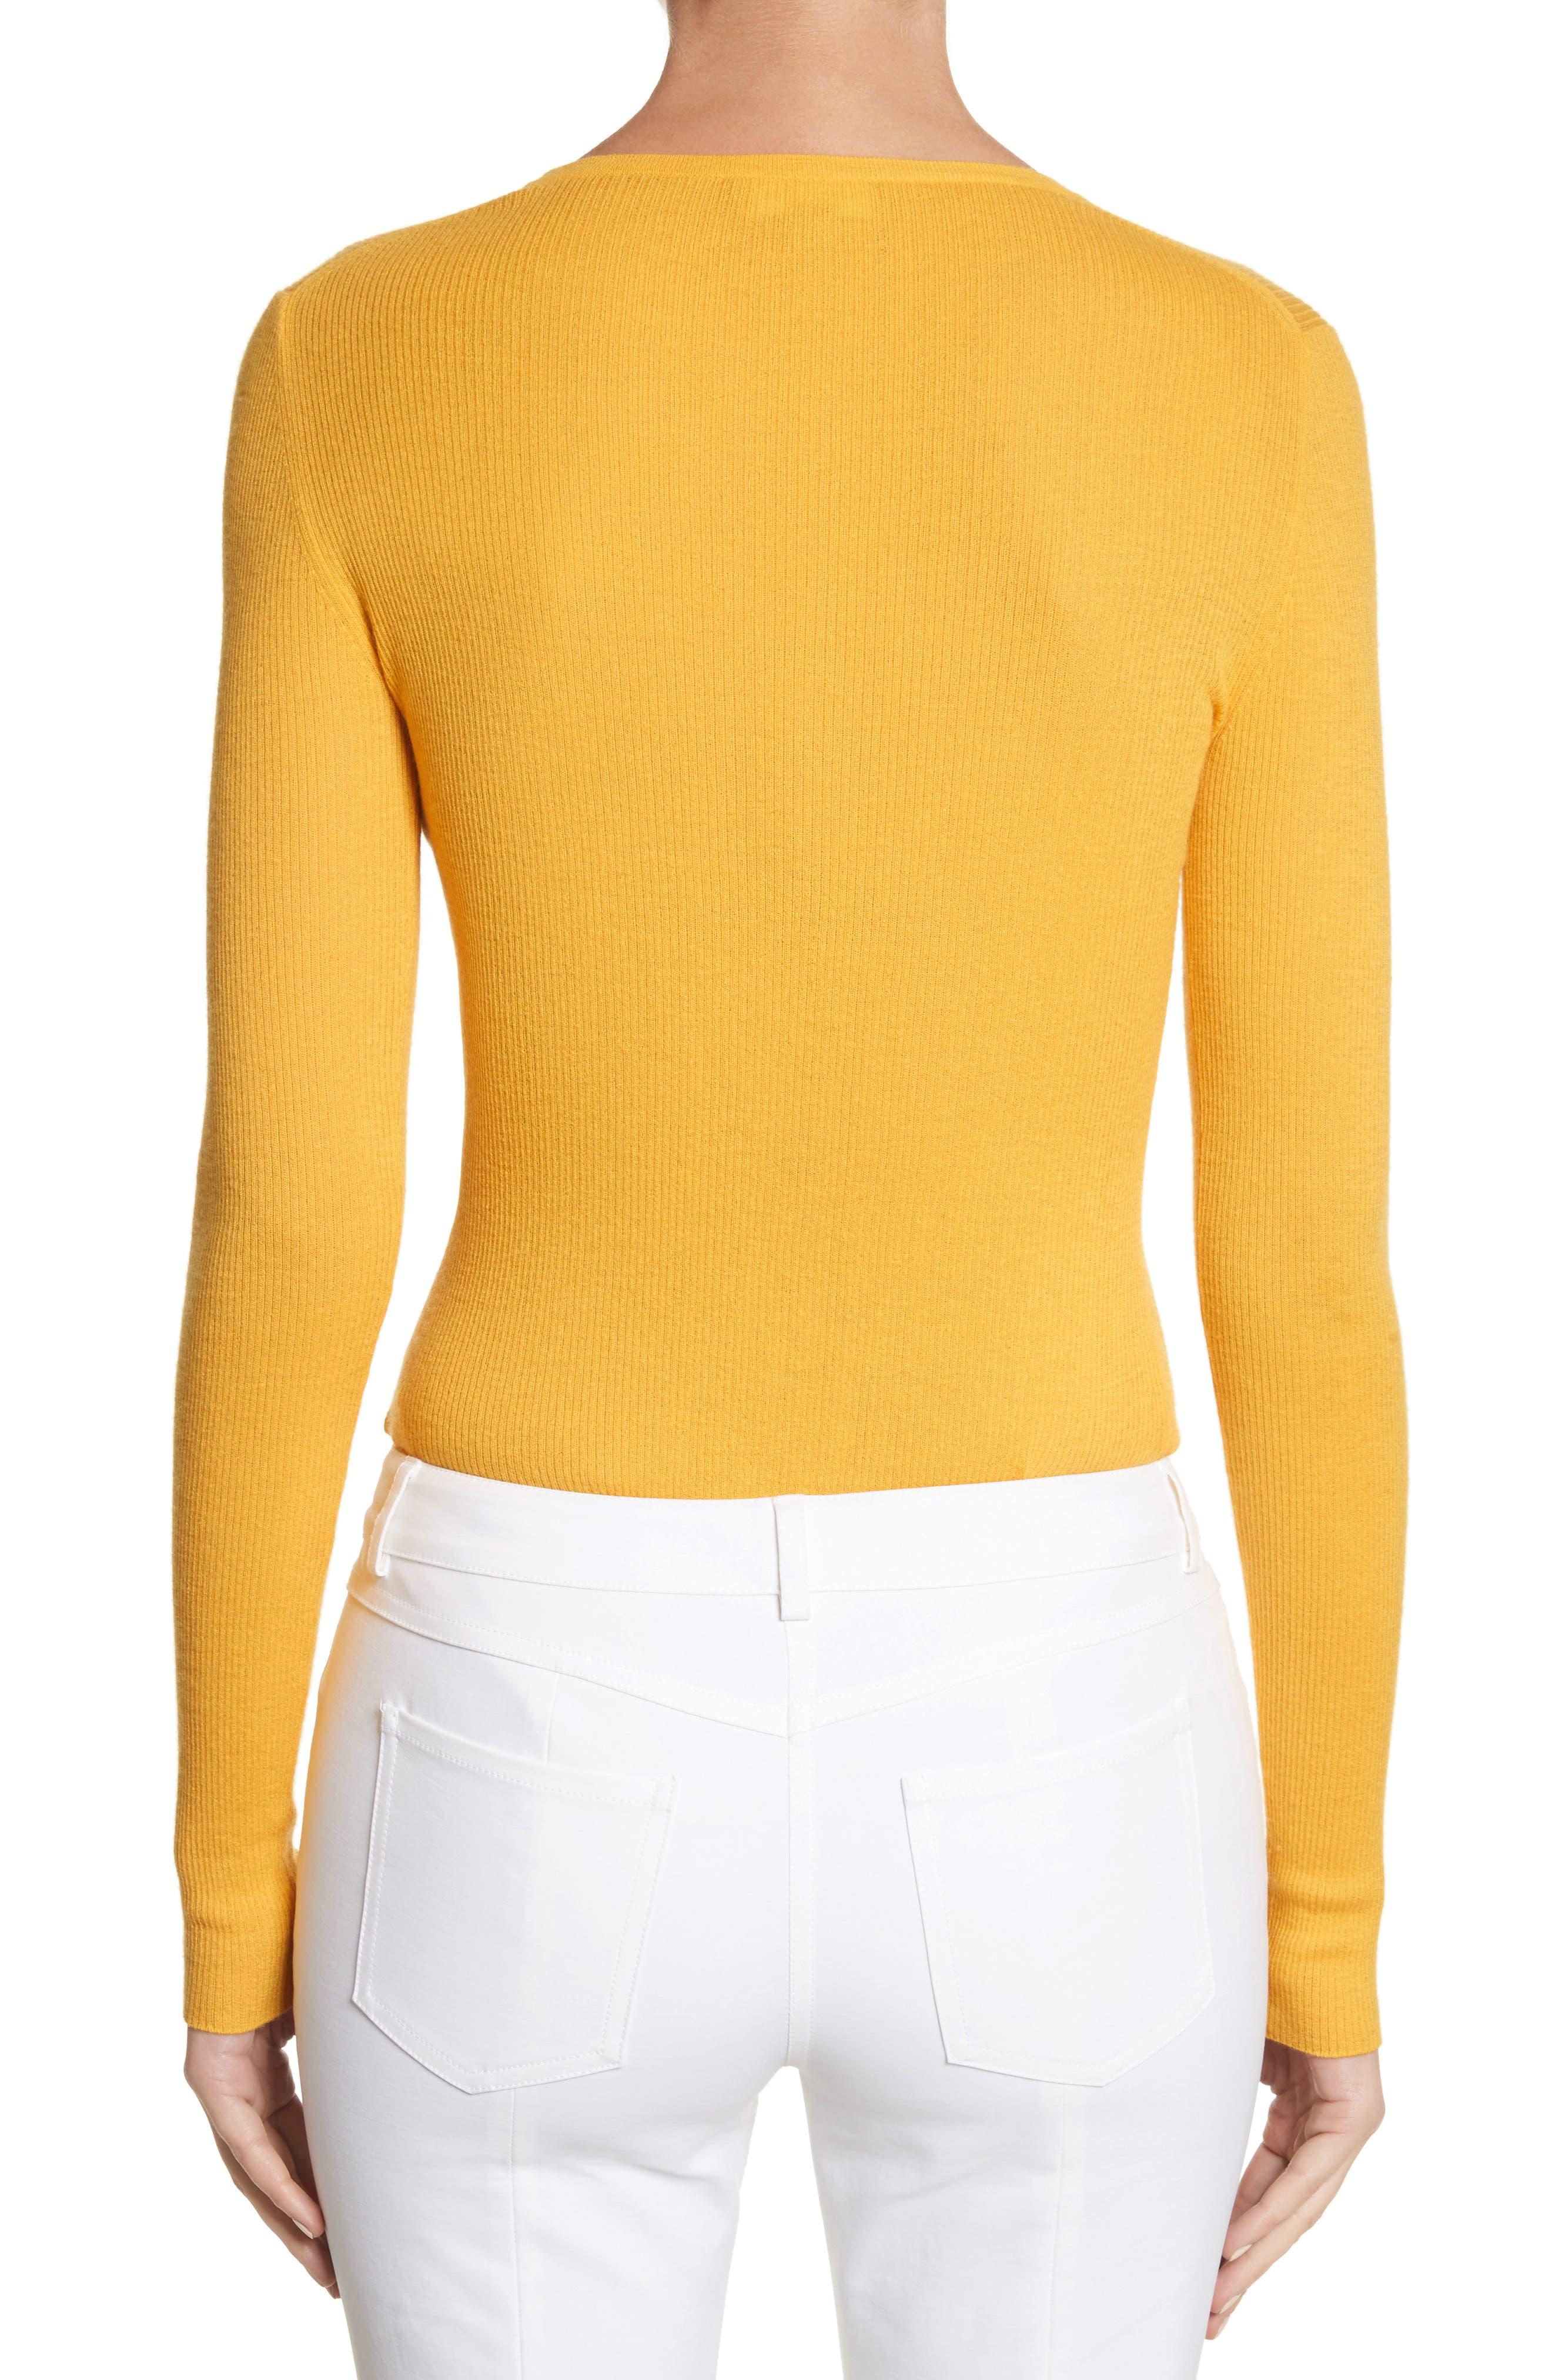 Cashmere Crewneck Sweater,                             Alternate thumbnail 2, color,                             110